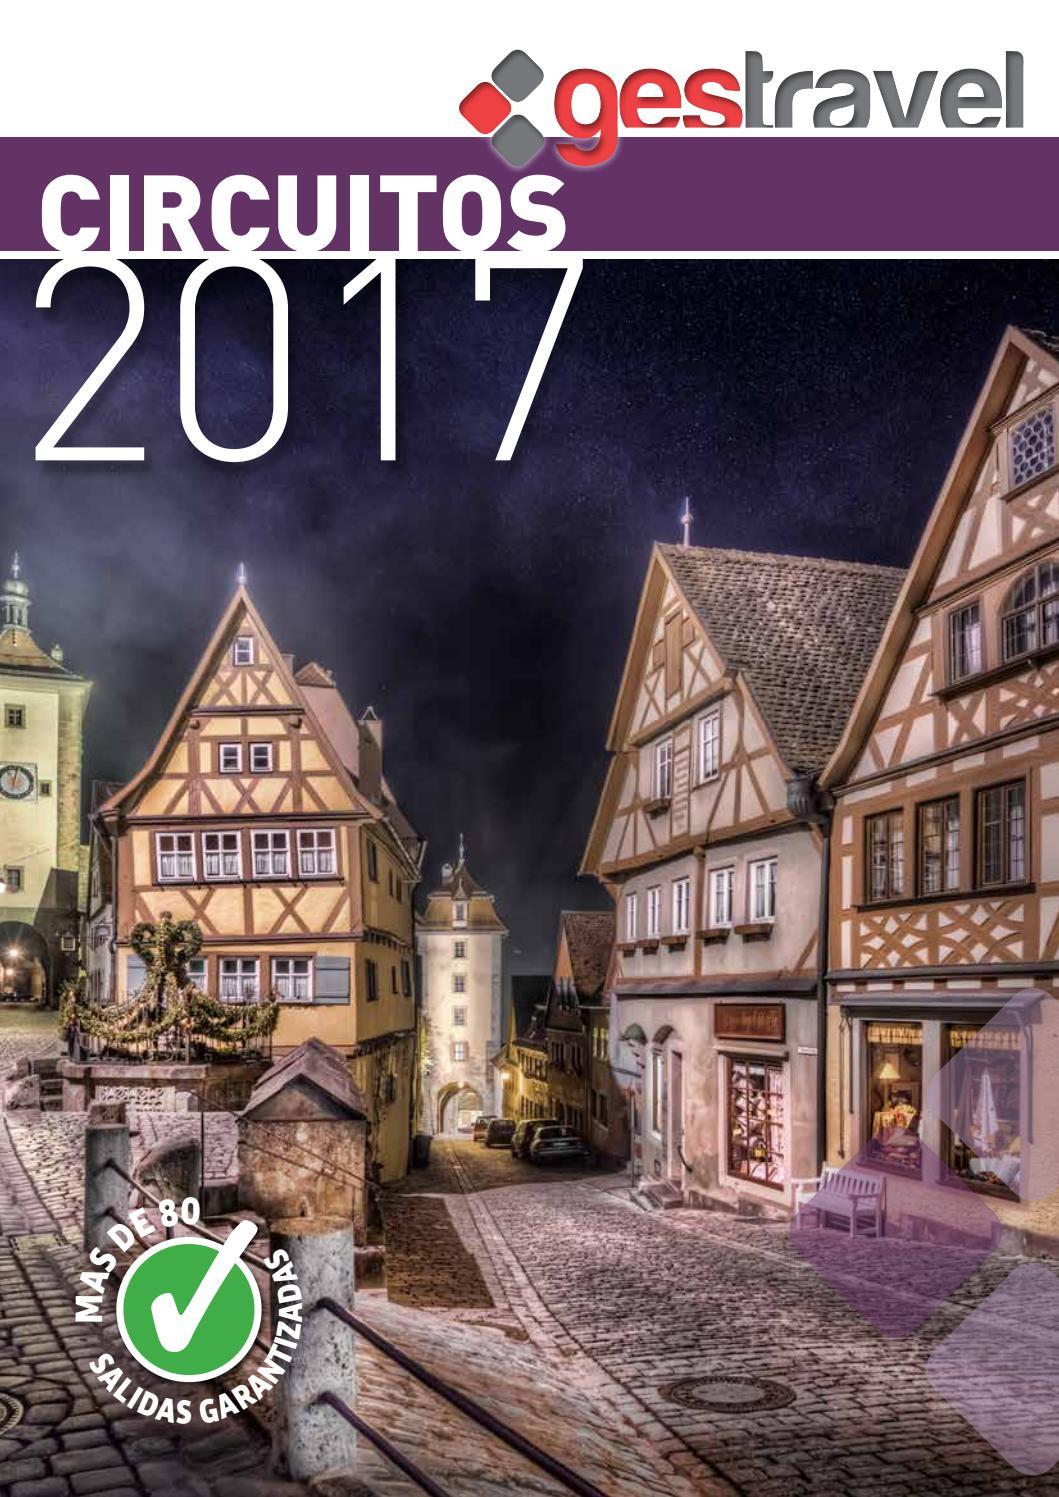 VERANO 2017 - GESTRAVEL by Gestravel YEC Segle XXI, SL - issuu